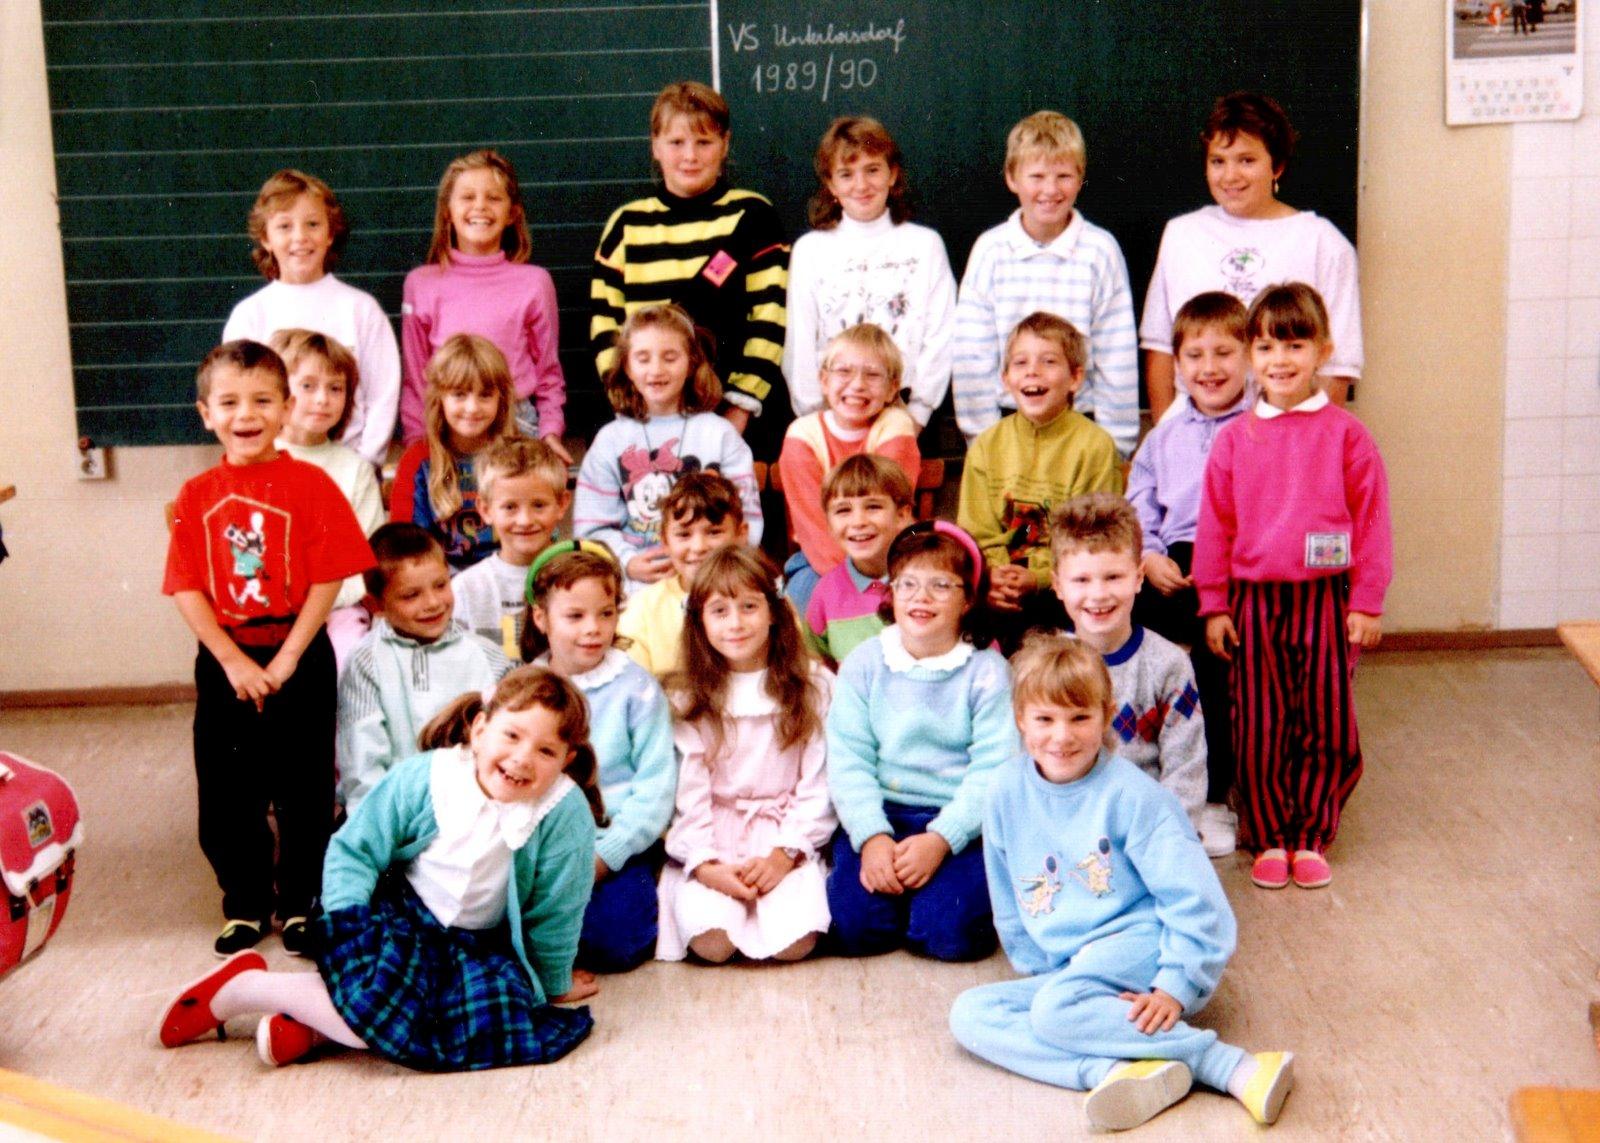 1989-90 1.-4. Schulstufe (1.+2. Klasse - ohne Lehrer)